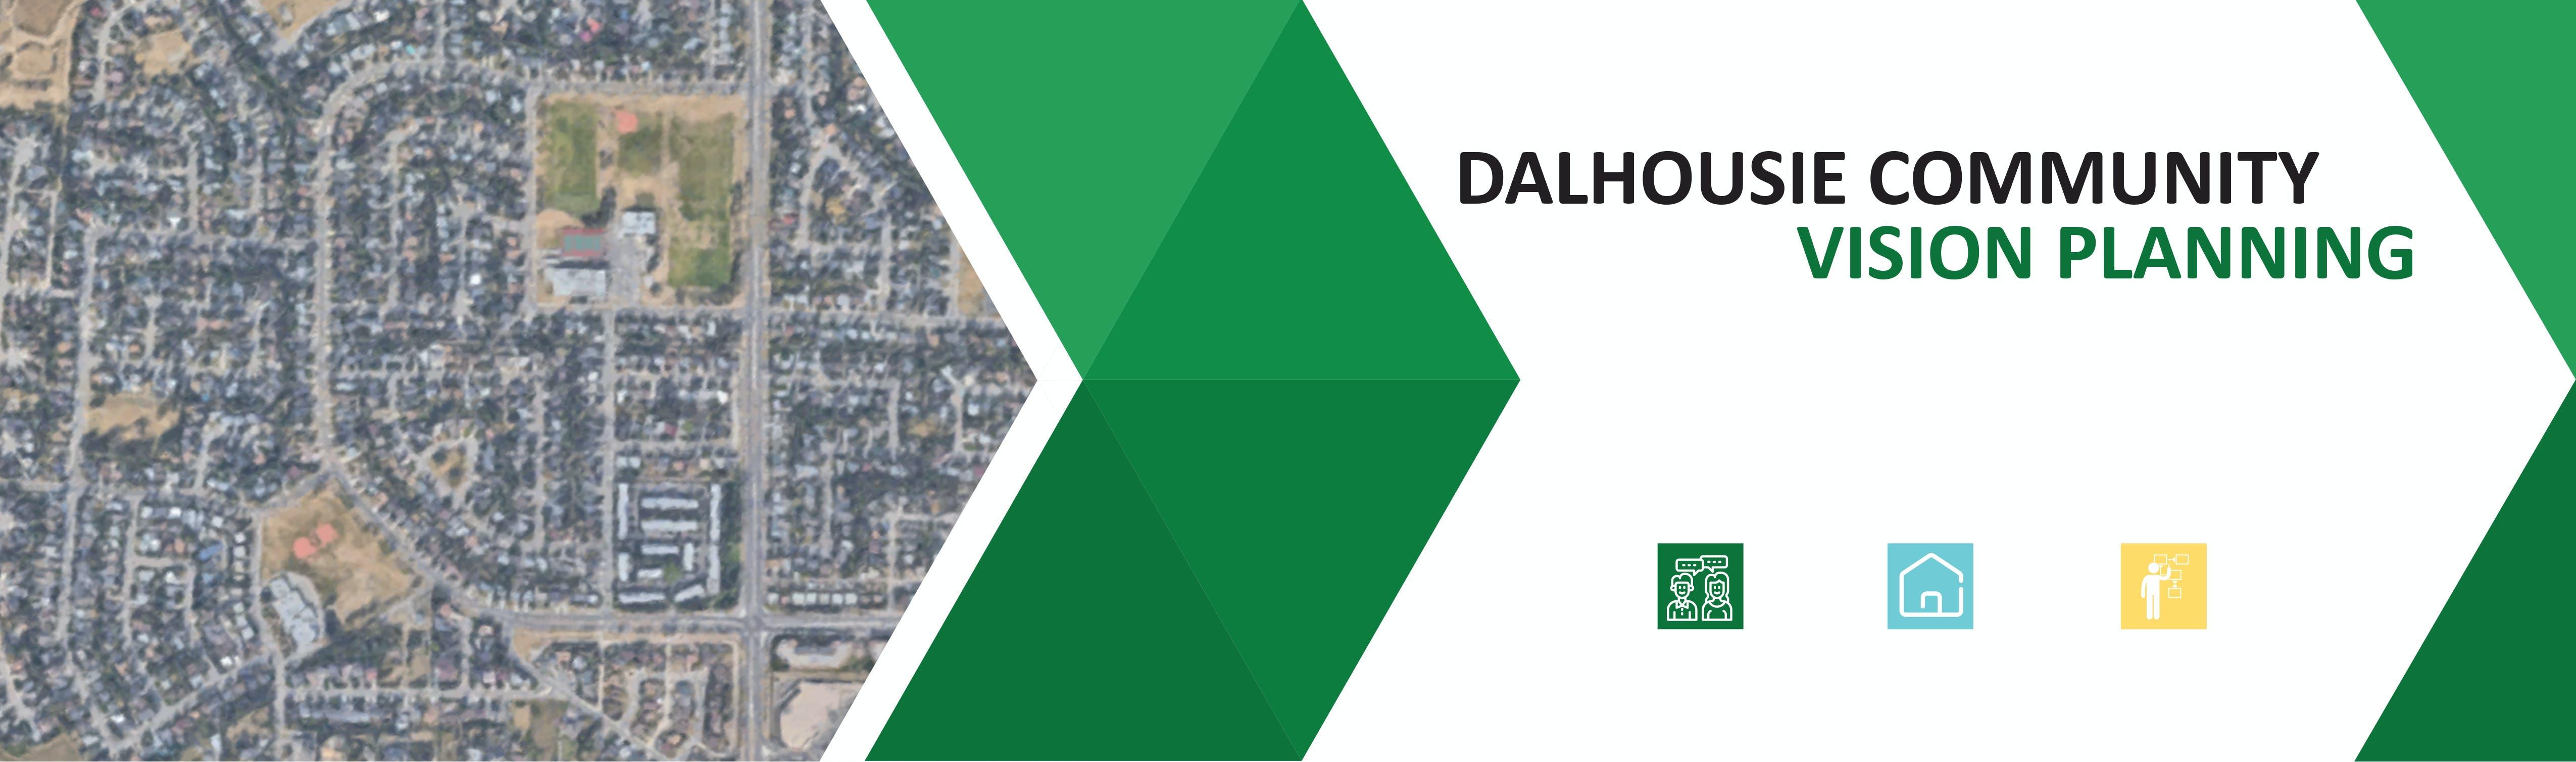 Dalhousie Community Vision Planning